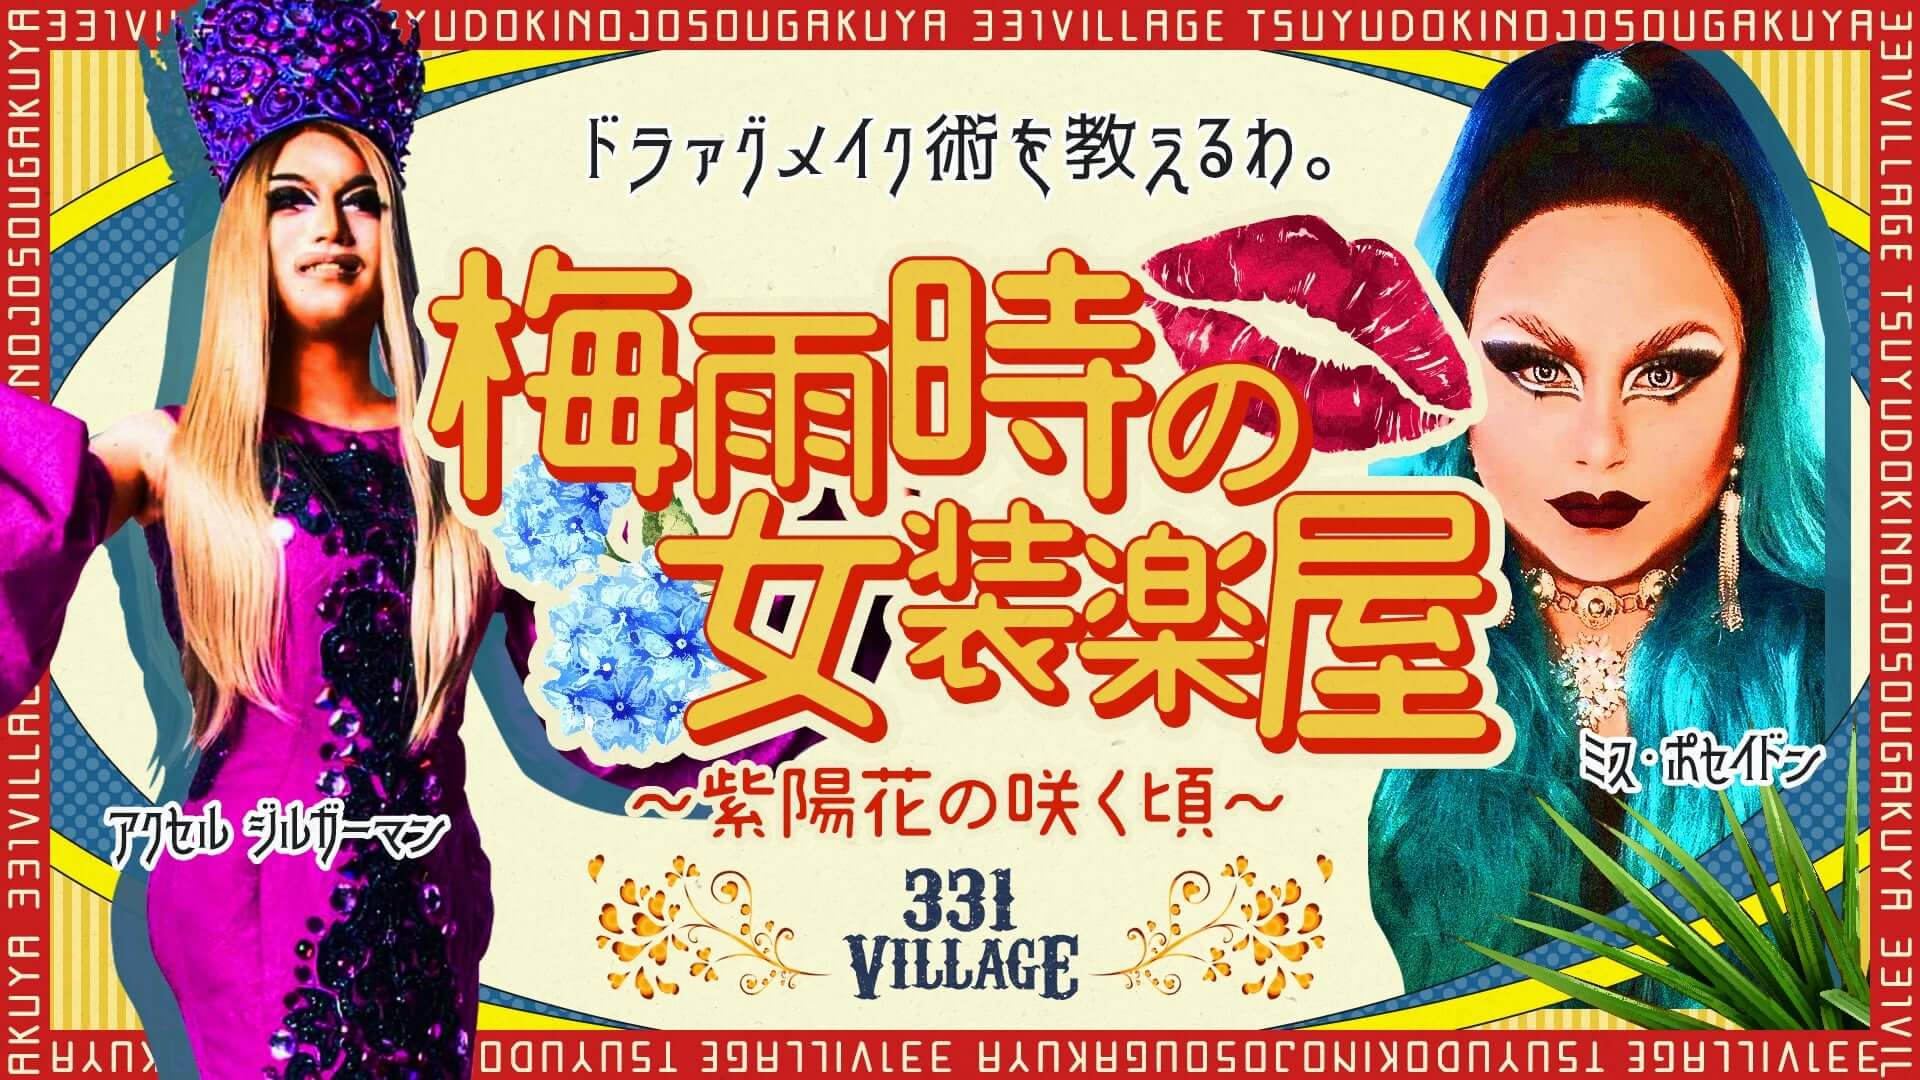 Moment Tokyo主催デジタルフェス<331VILLAGE>の第1弾ラインナップが発表|TAAR、Kotsu、Kamui、Yohji Igarashiなど music200525_311village_lineup_11-1920x1080